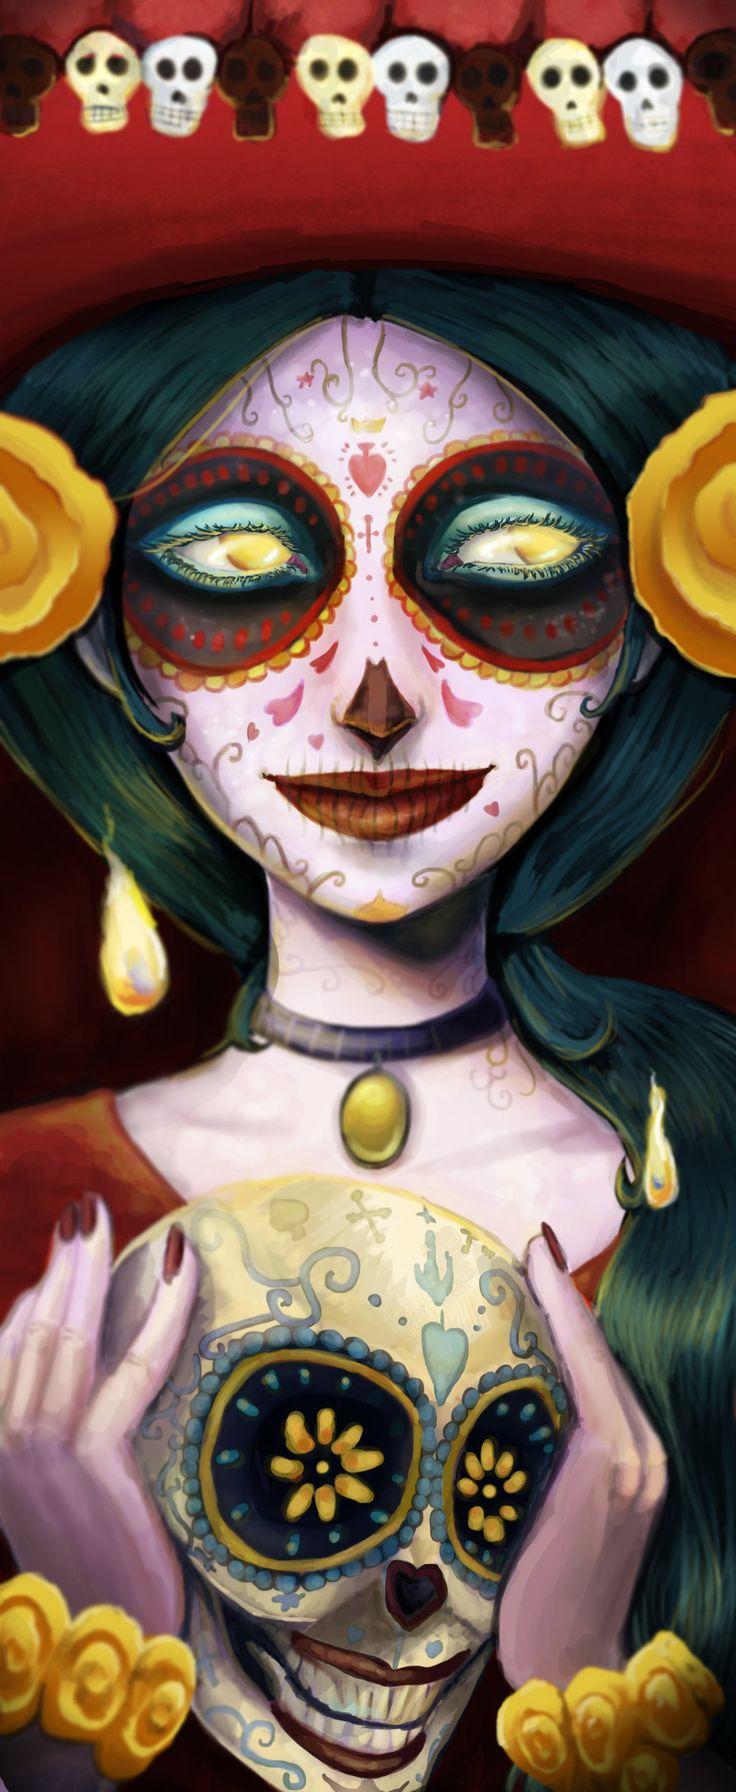 La Muerte- The Book of Life by homicidalteapot.deviantart.com on @DeviantArt